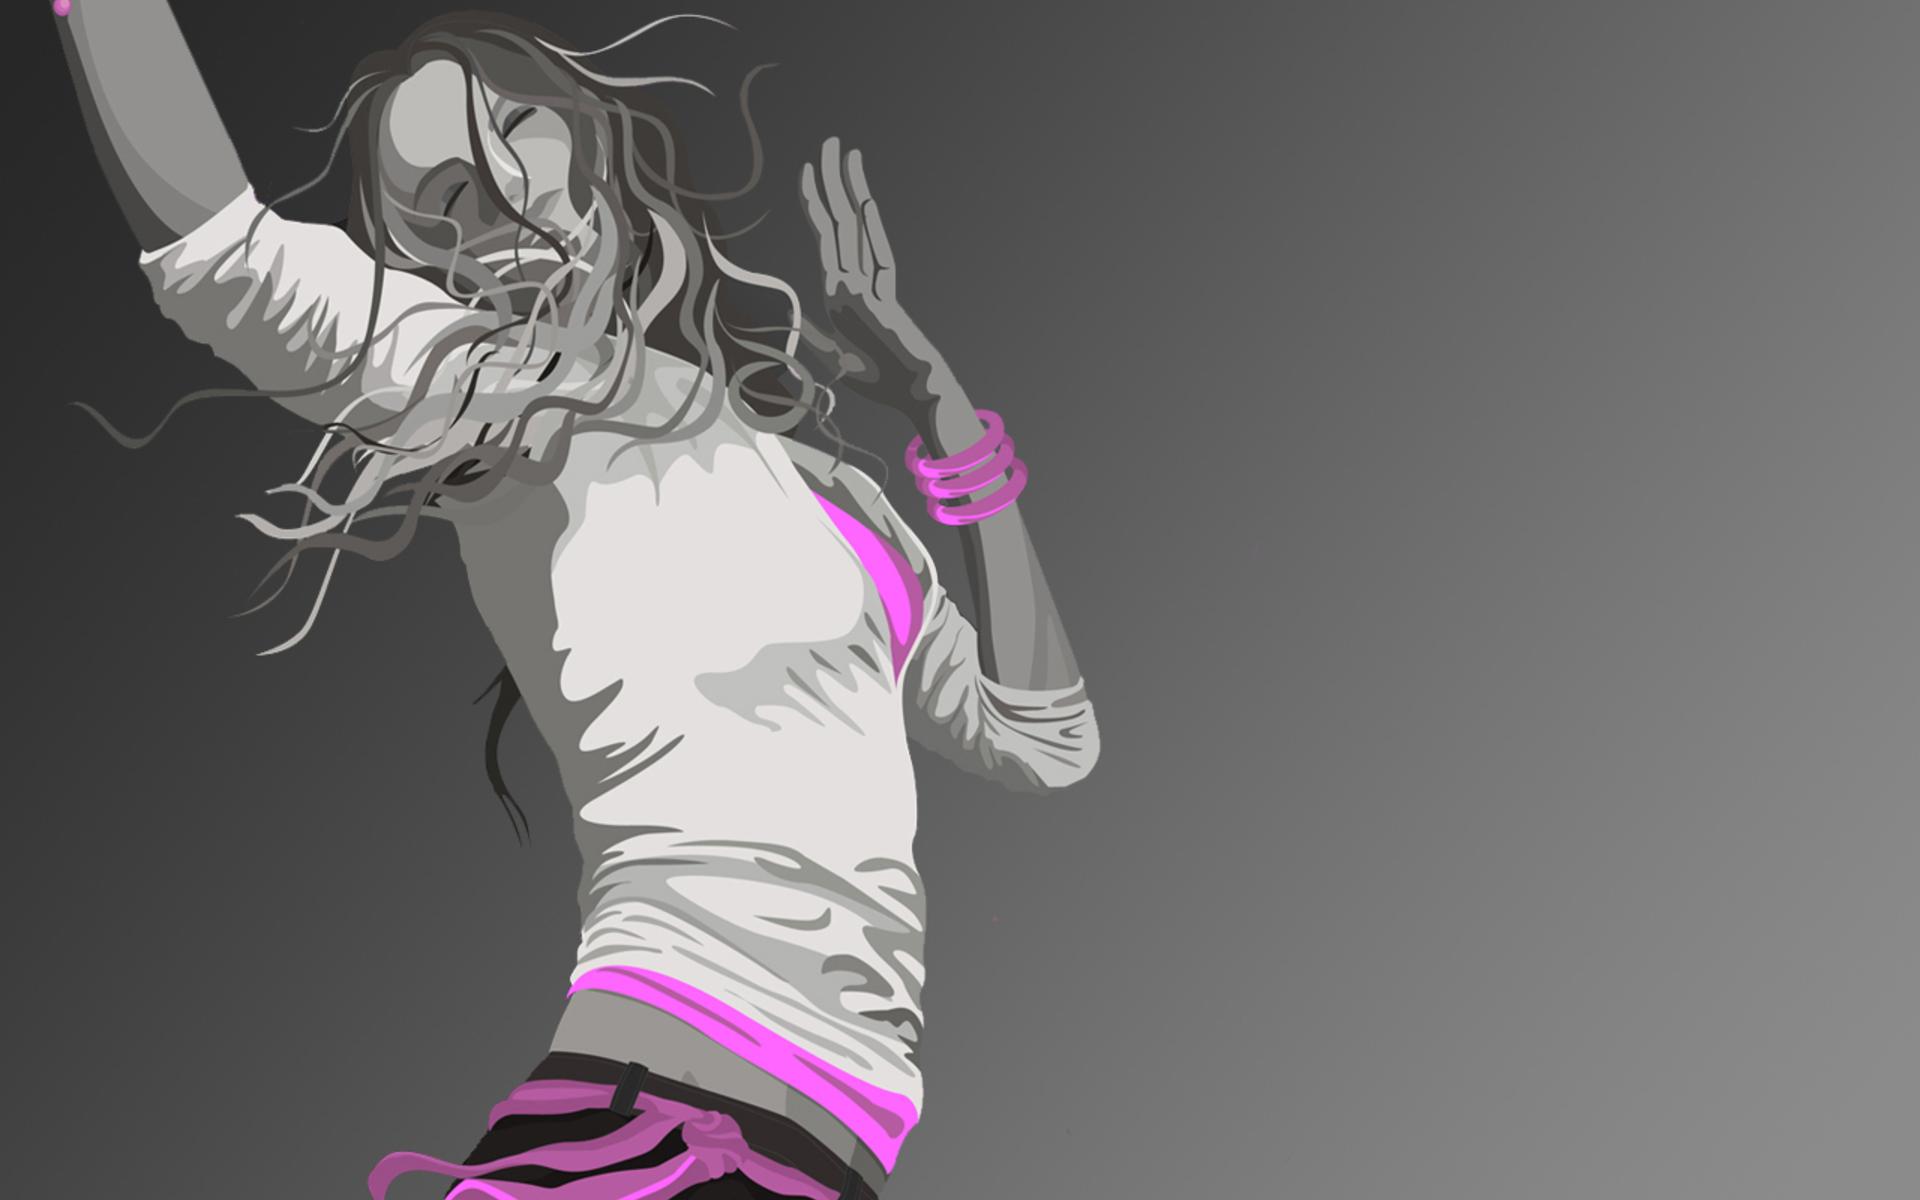 Gorillaz Iphone Wallpaper Dance Hd Wallpaper Background Image 1920x1200 Id